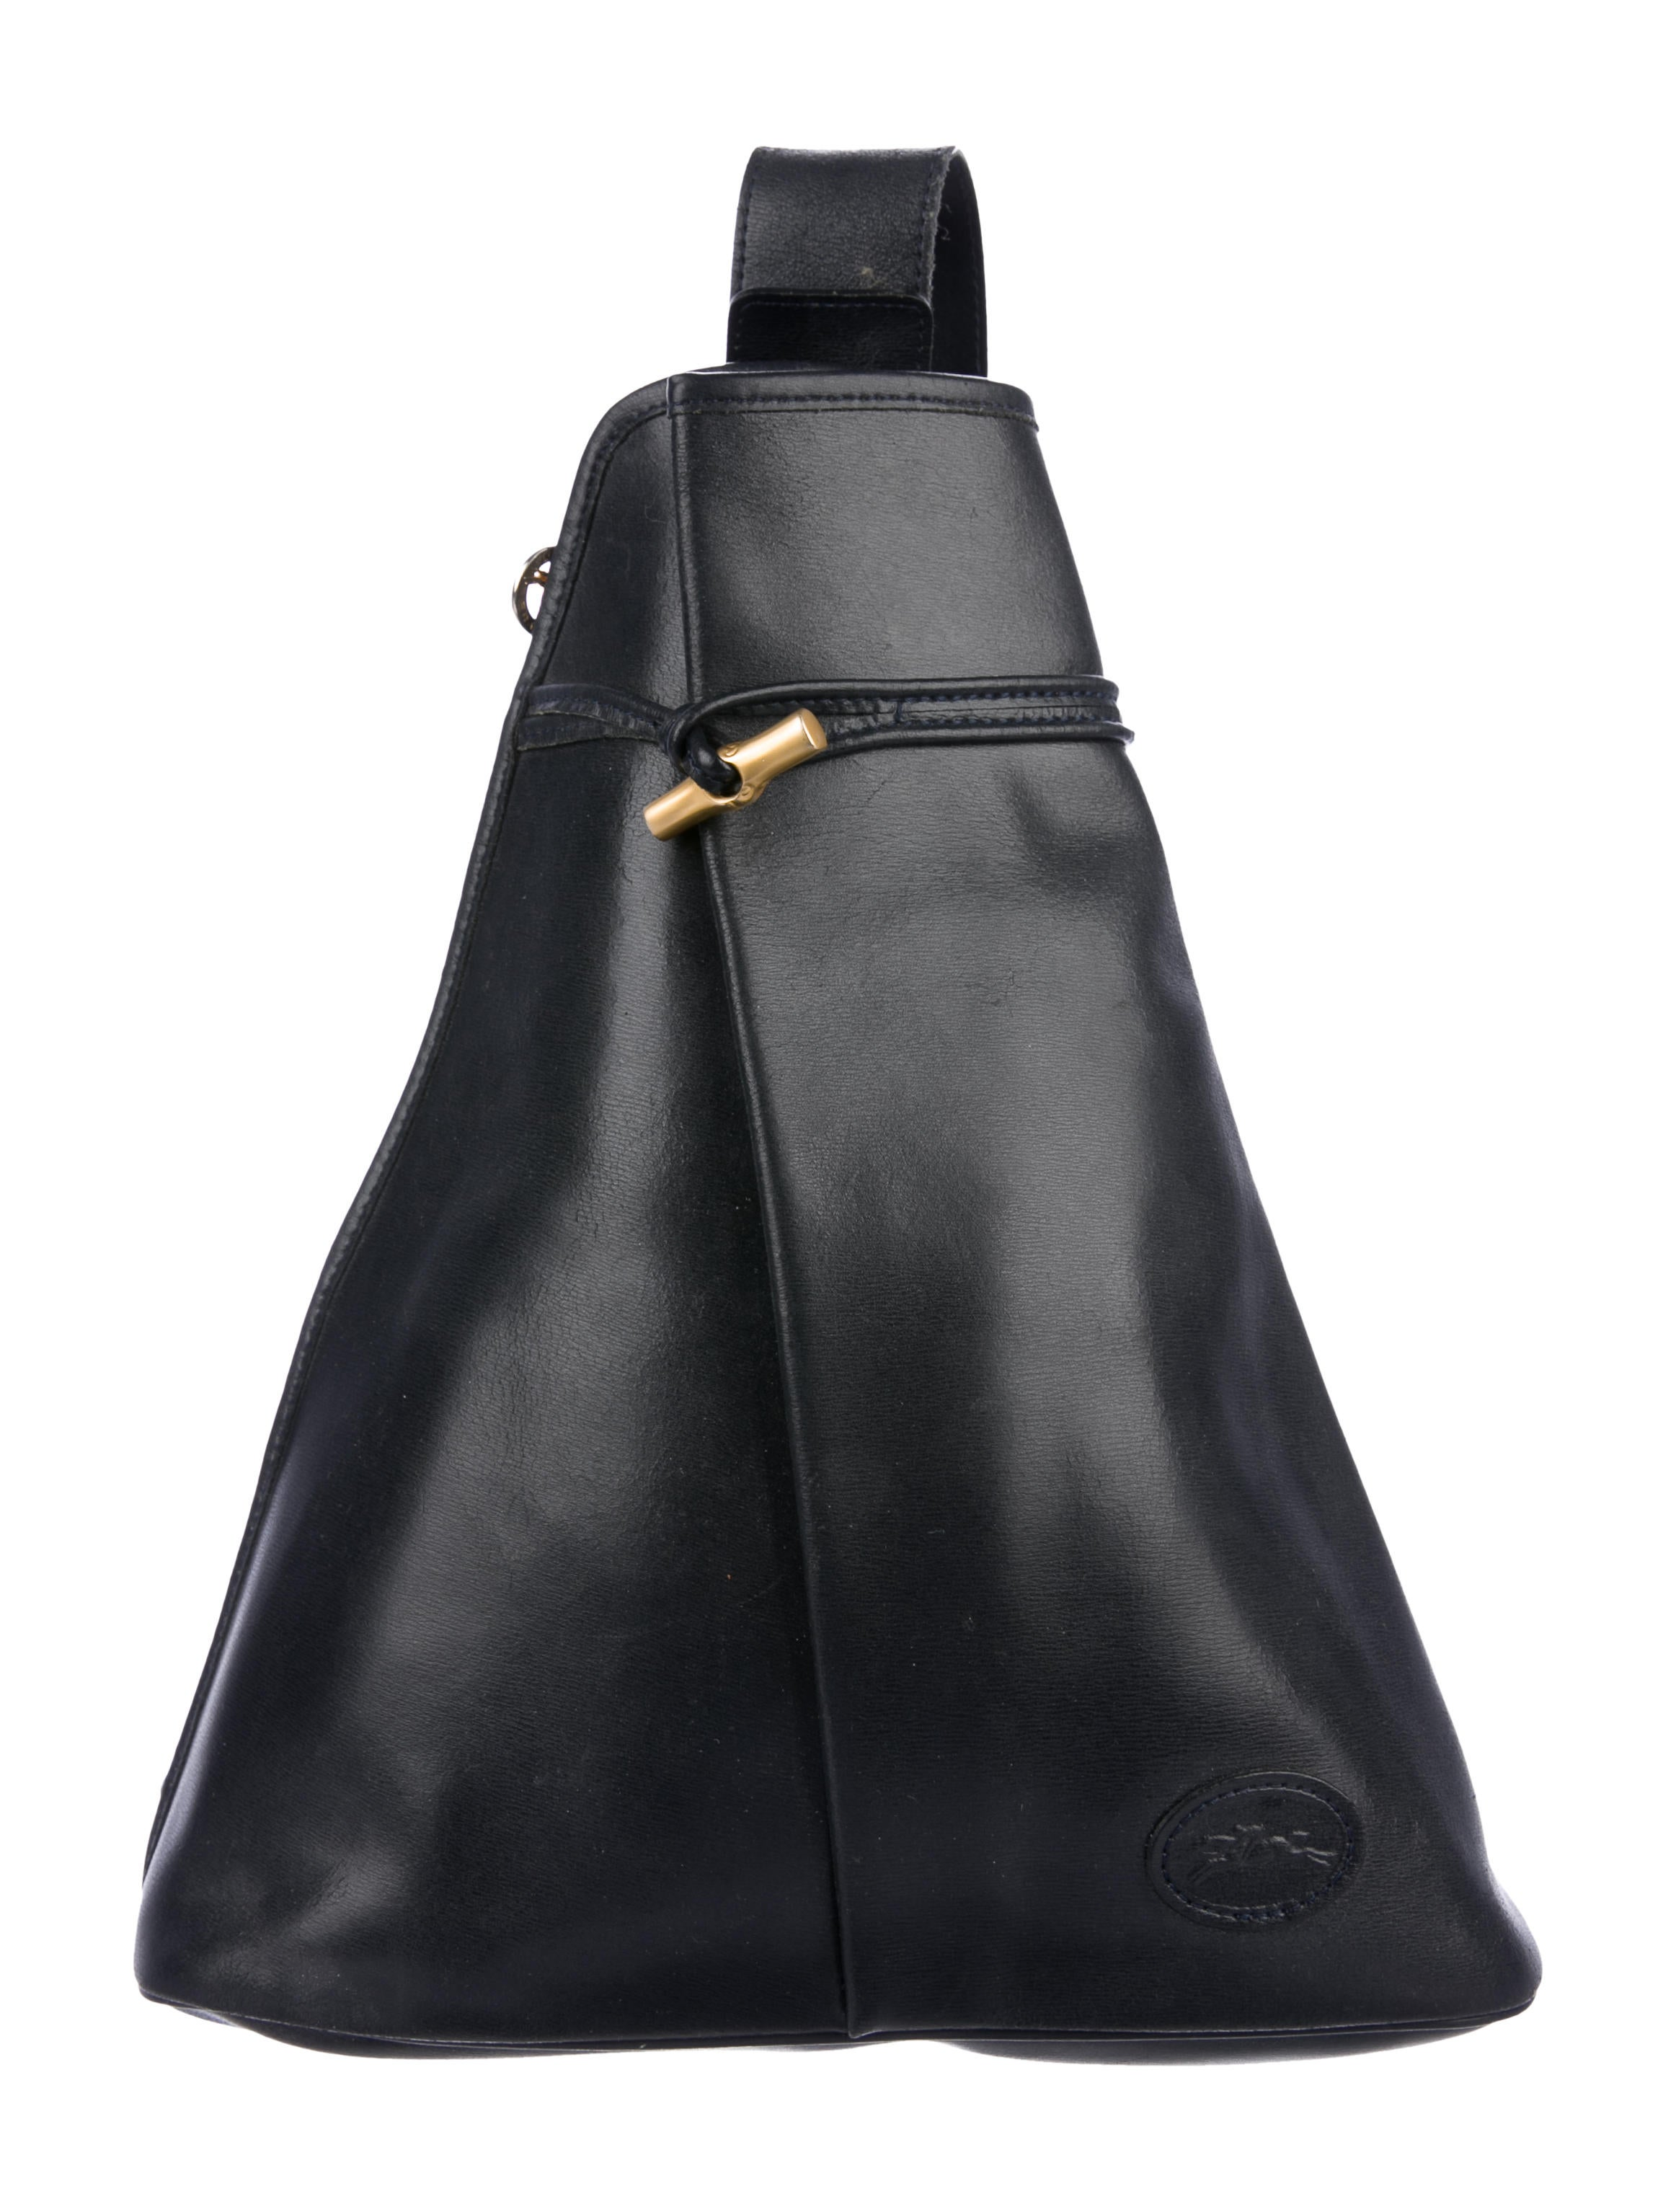 Longchamp Roseau Sling Bag - Handbags - WL822482   The RealReal